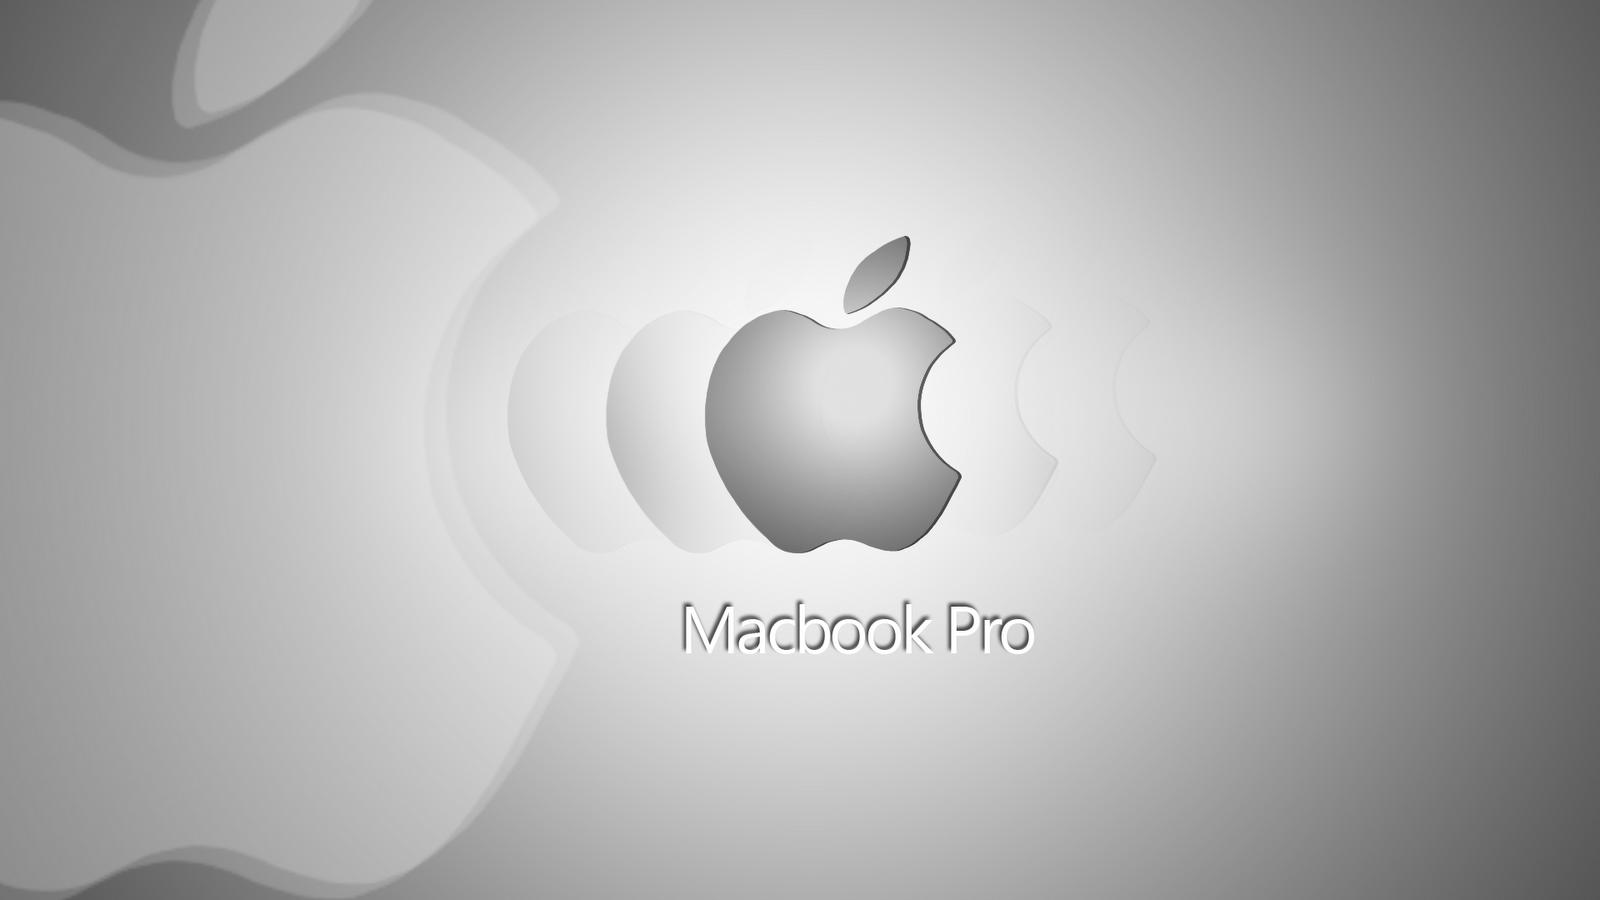 Apple Macbook Pro Wallpapers Group (85+)